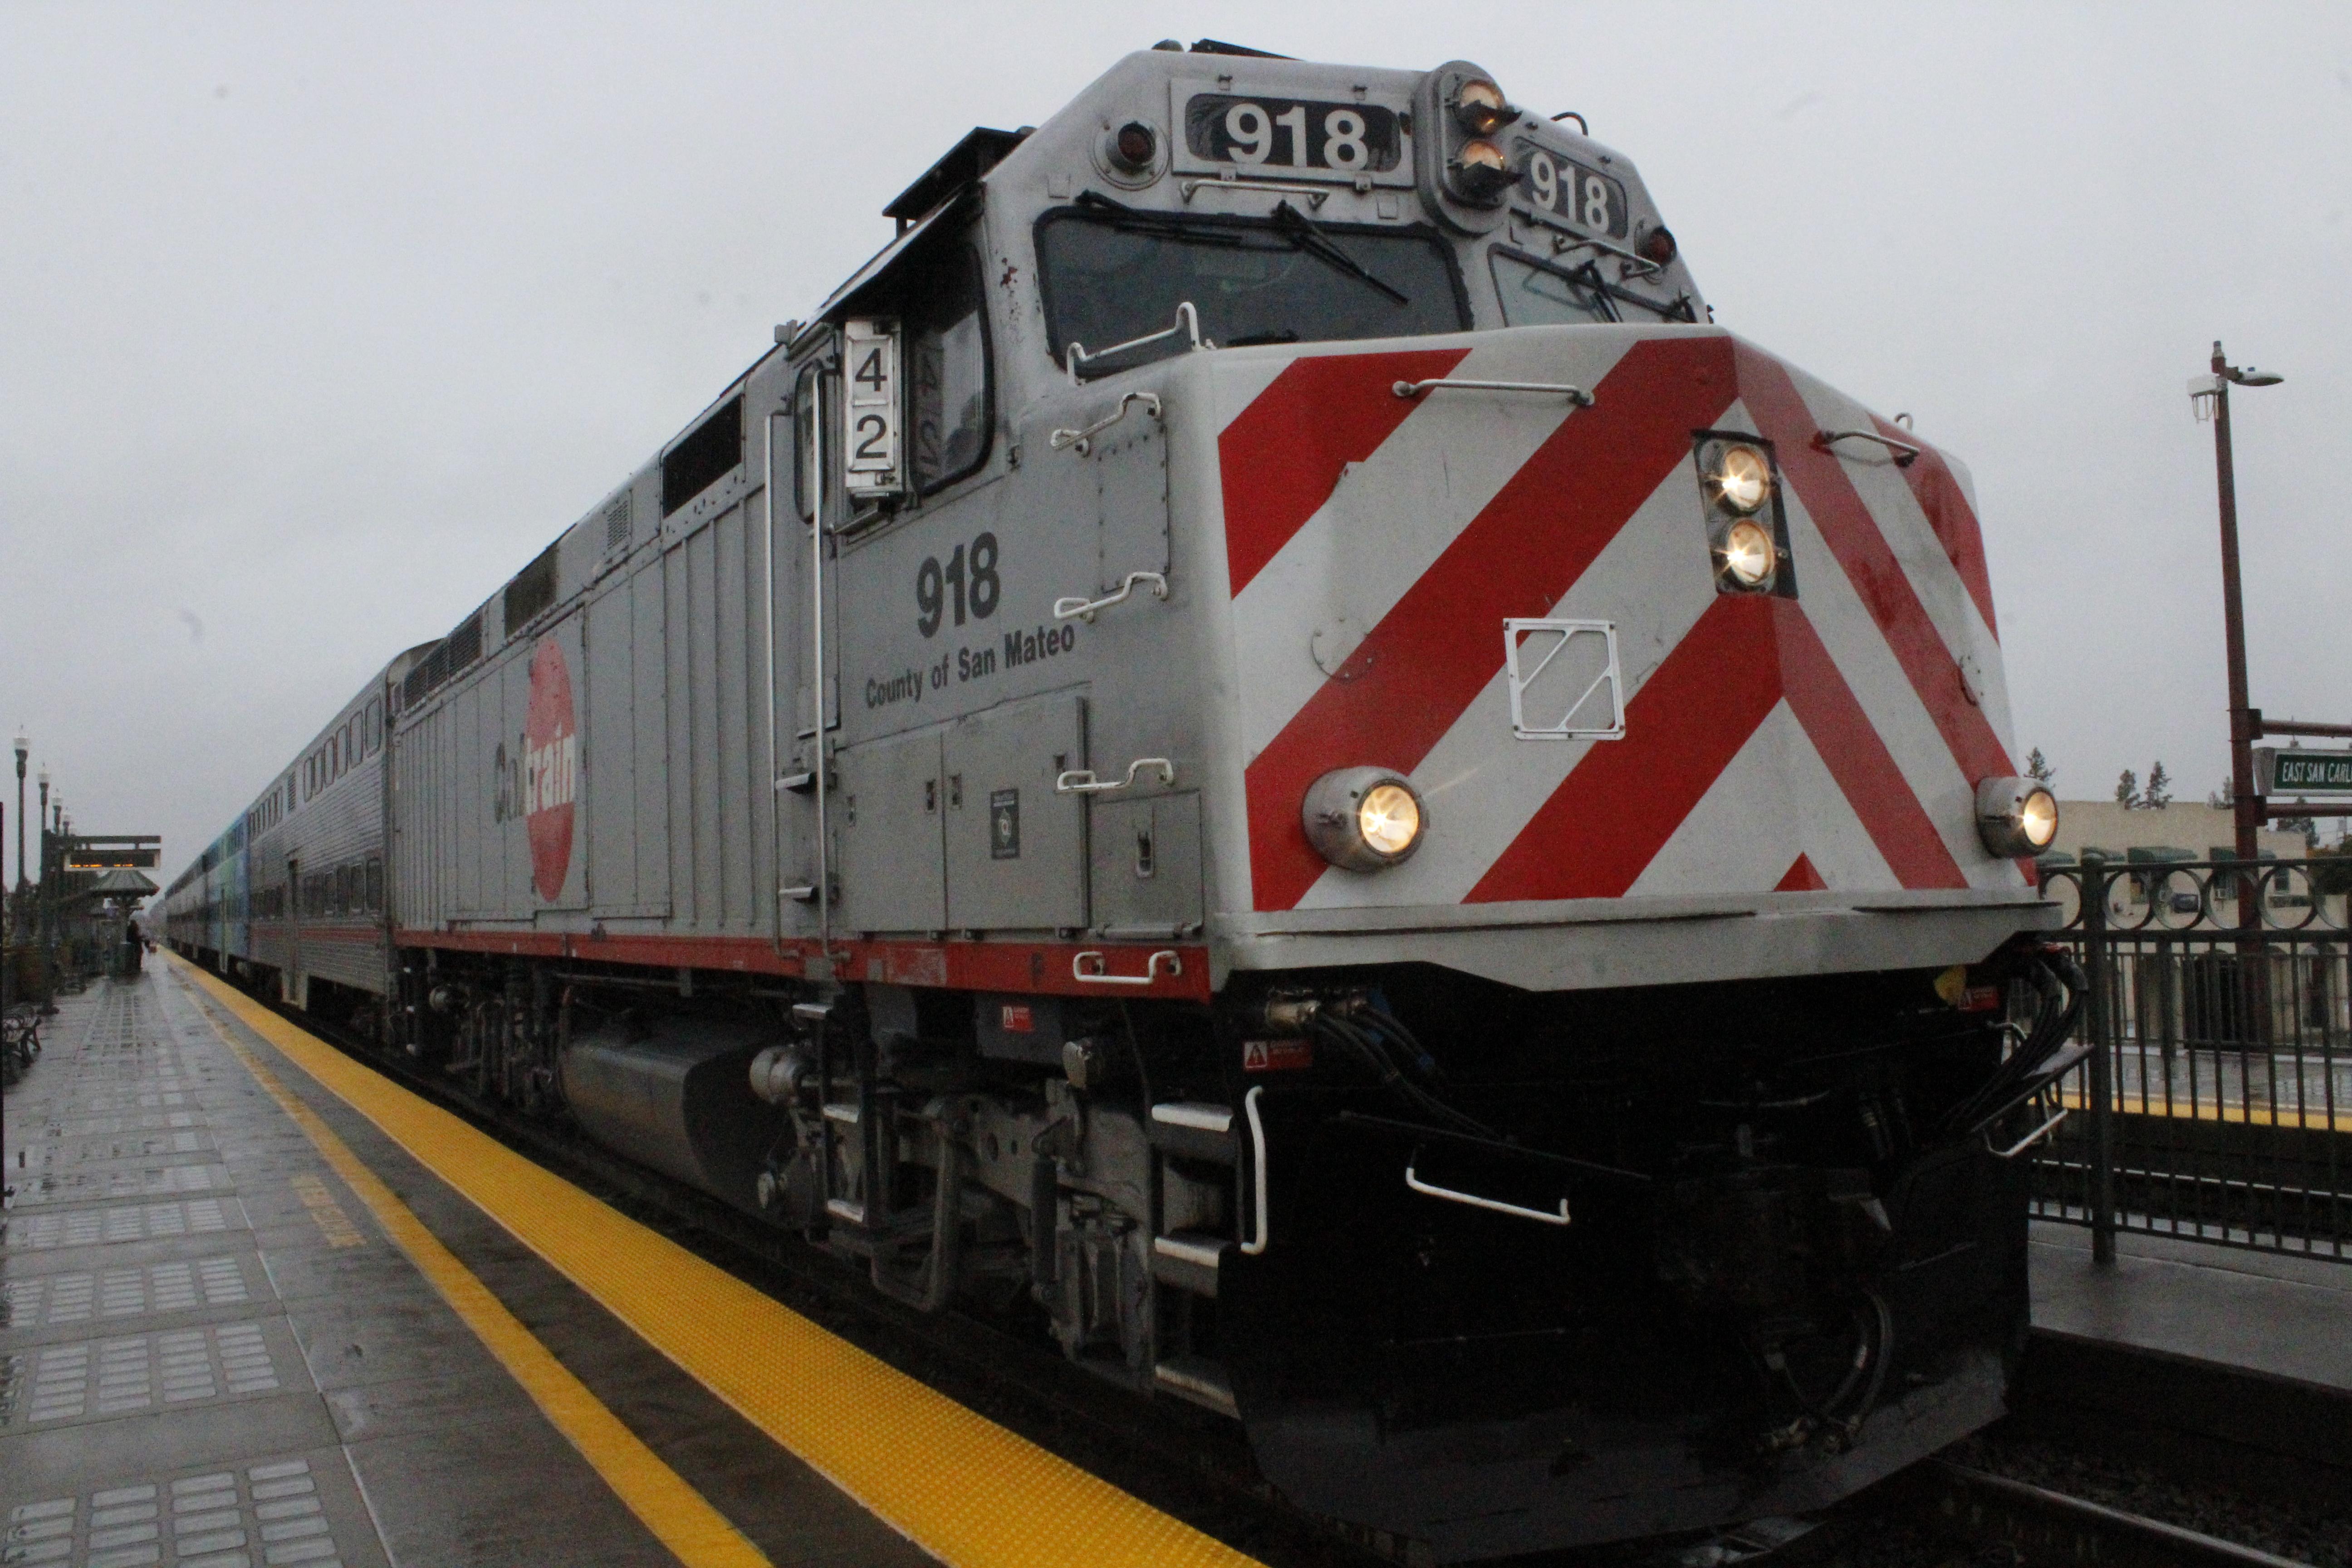 Caltrain locomotive unit 918, County of San Mateo, at San Carlos Station